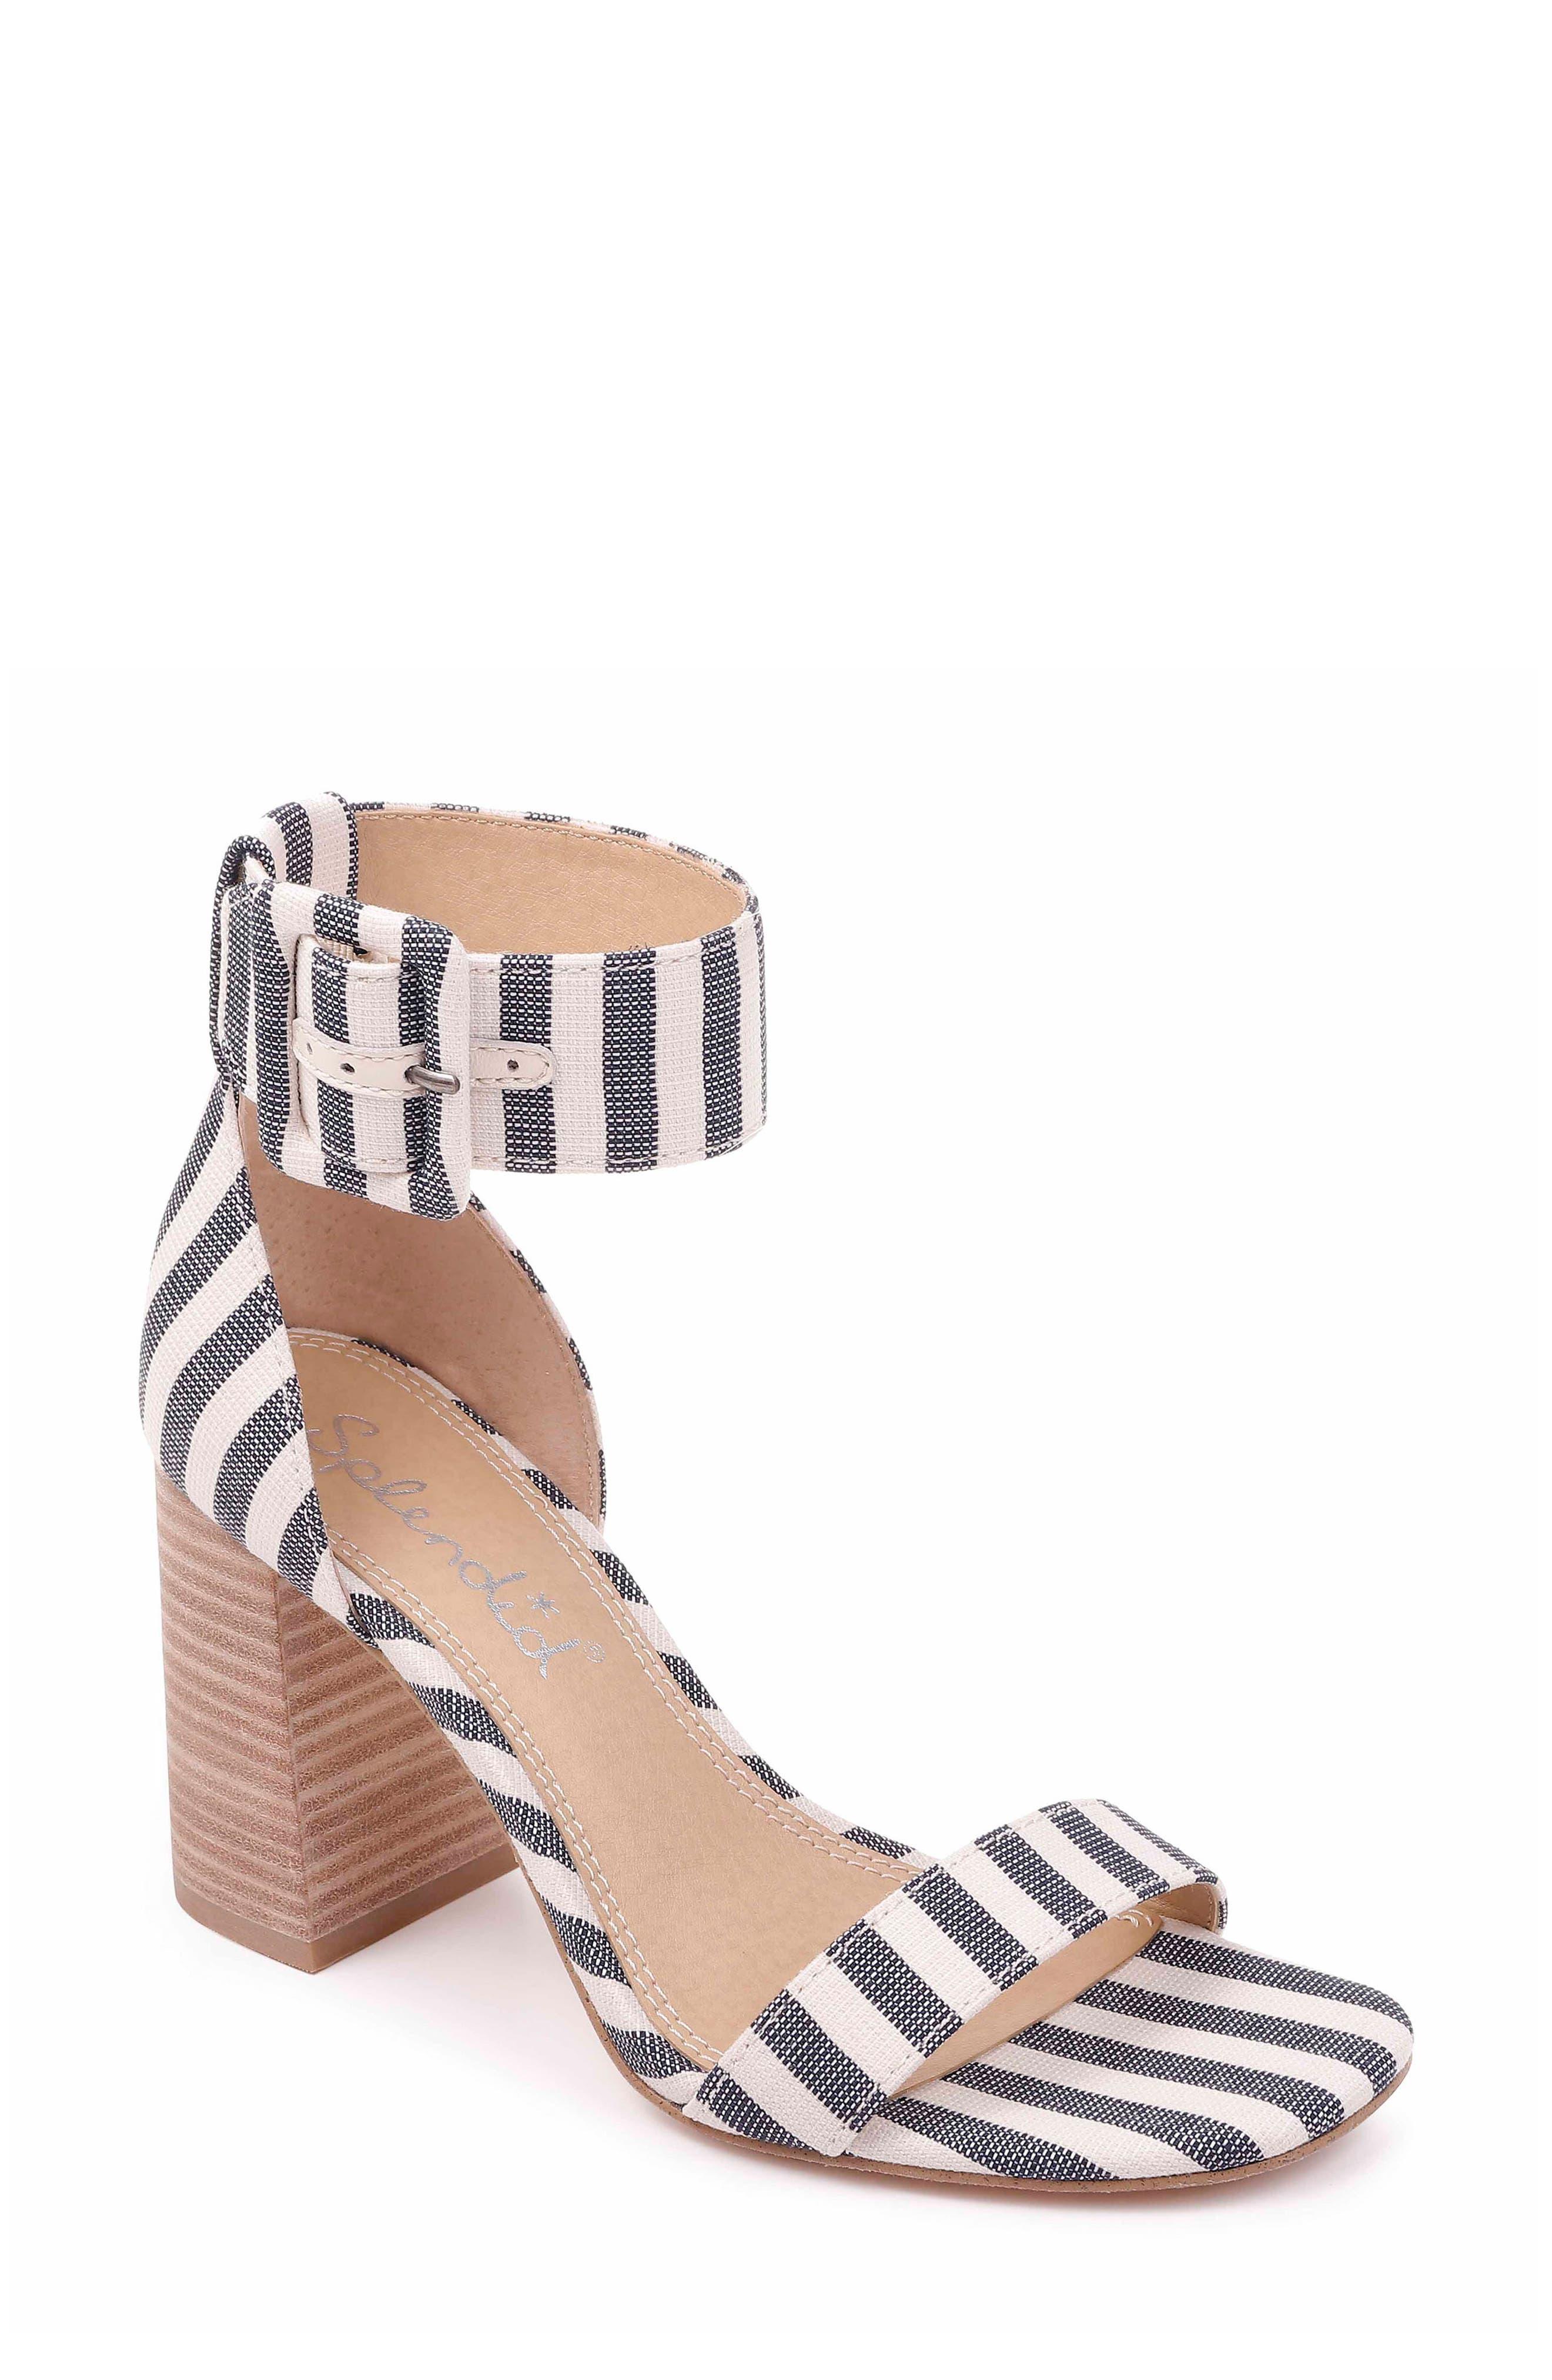 Splendid Block Heel Sandal, Blue